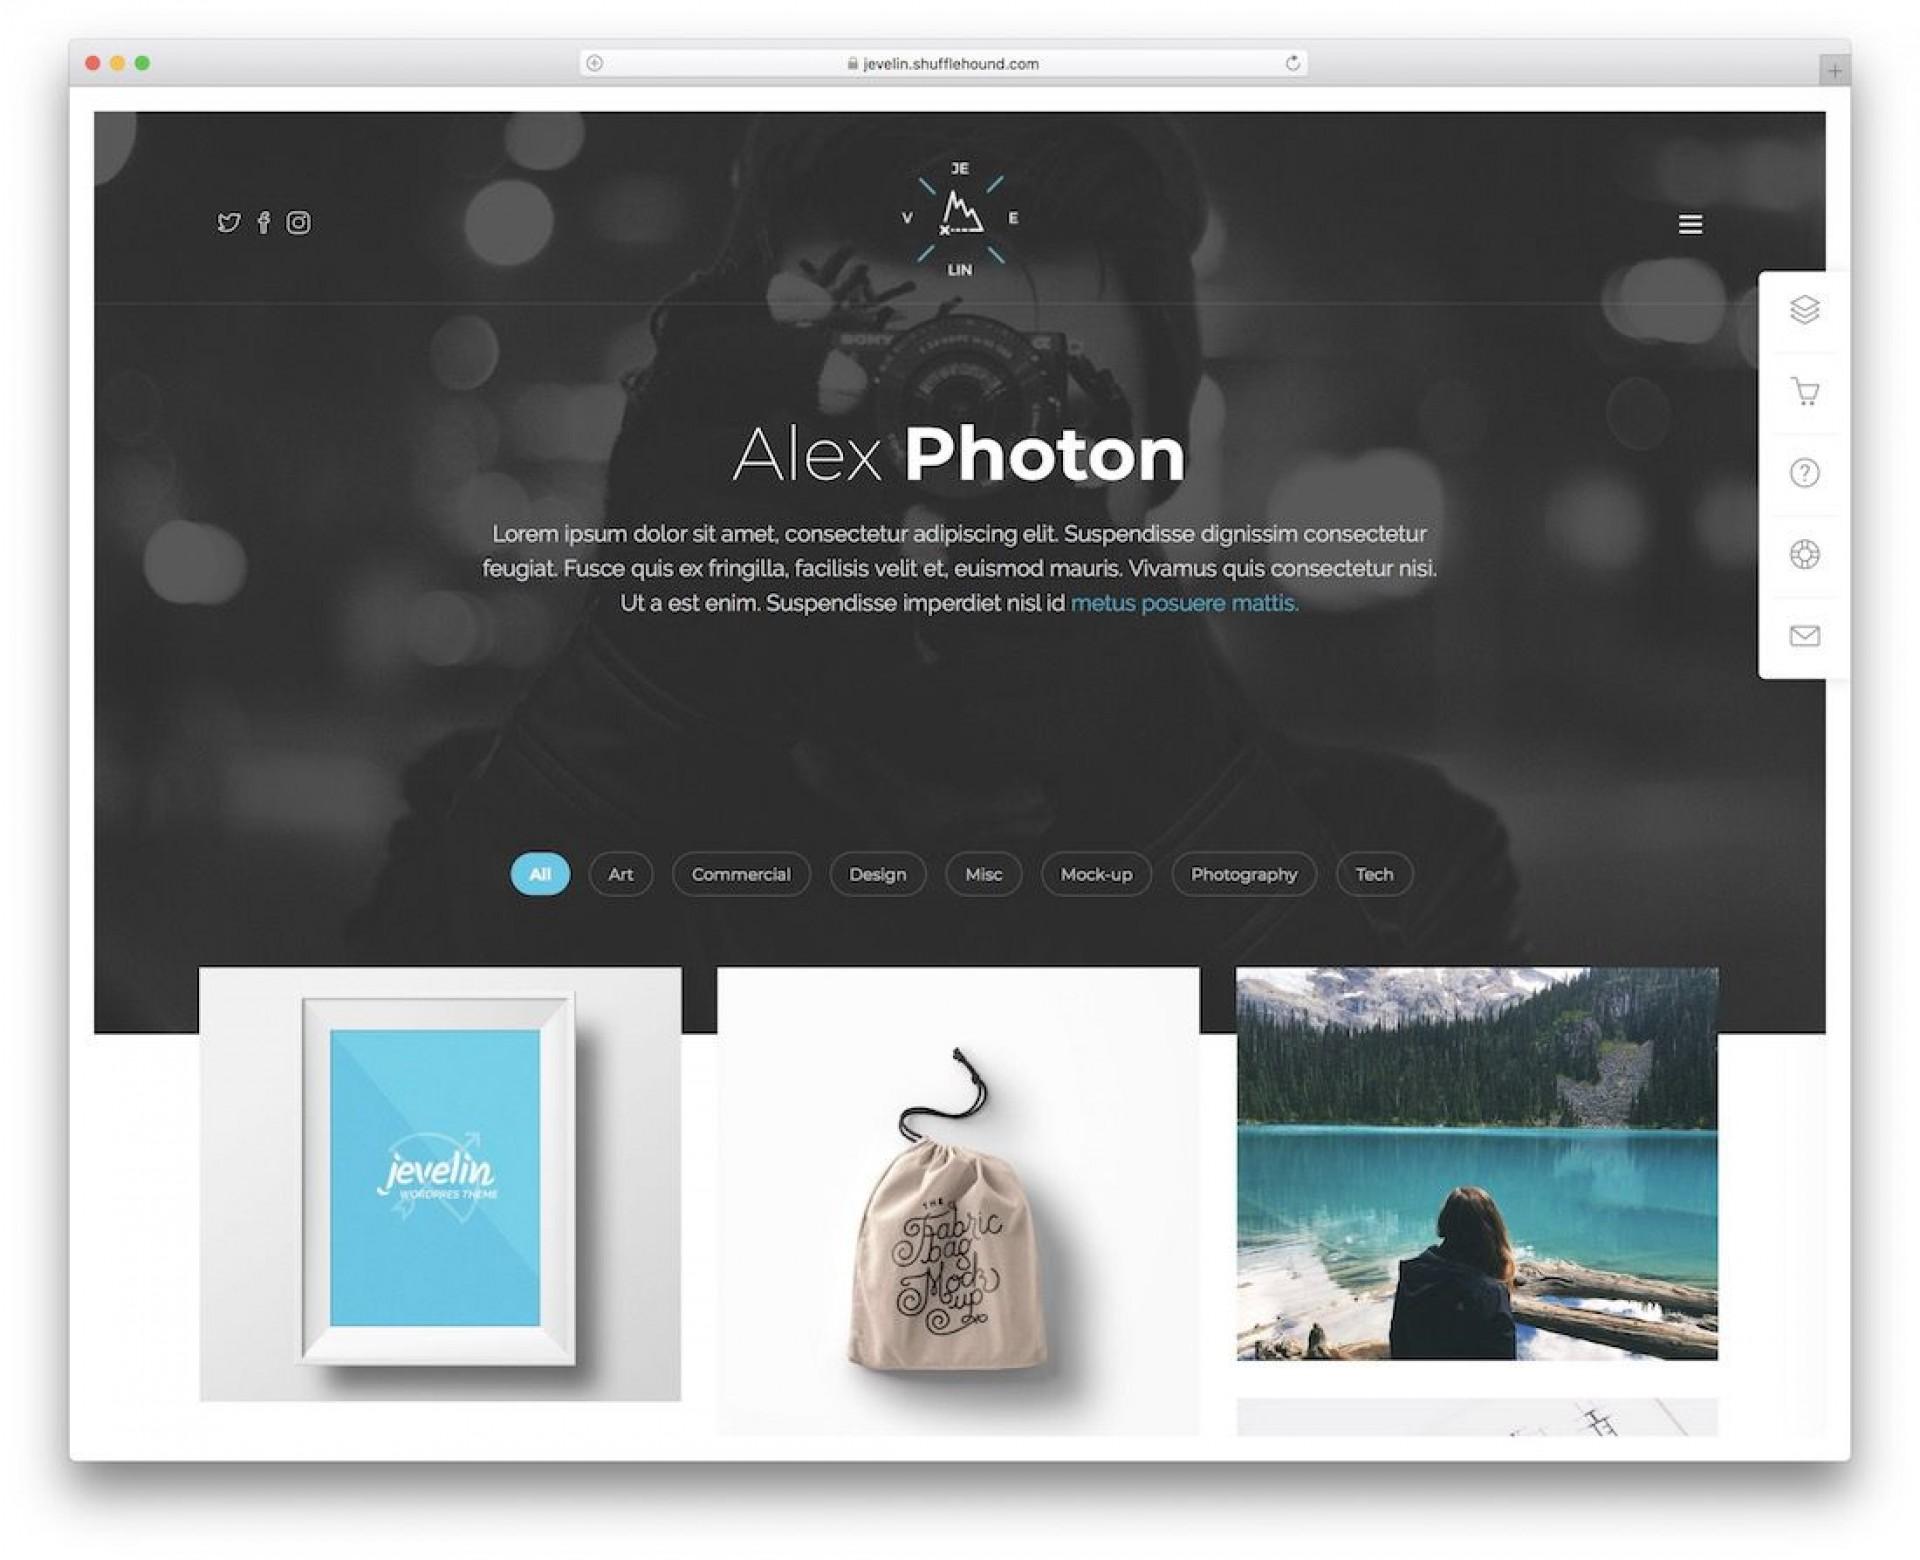 004 Shocking Free Professional Web Design Template Idea  Templates Website Download1920